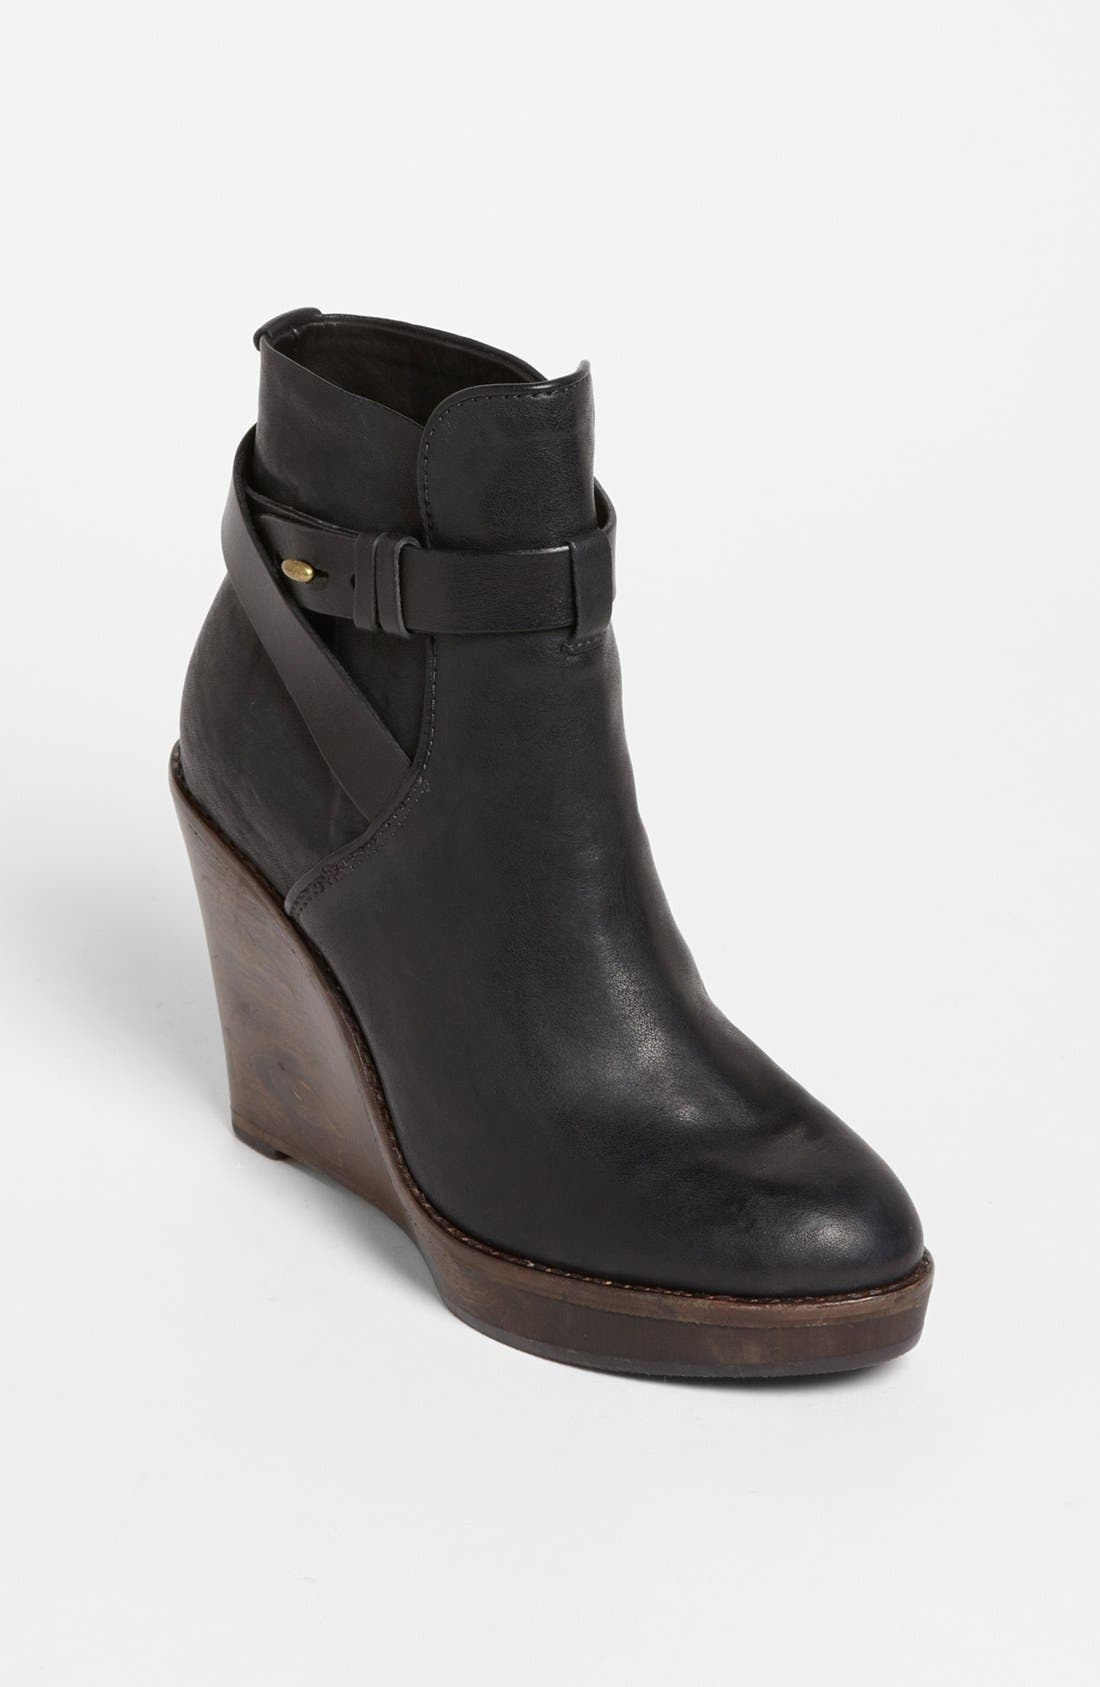 Alternate Image 1 Selected - rag & bone 'Emery' Boot